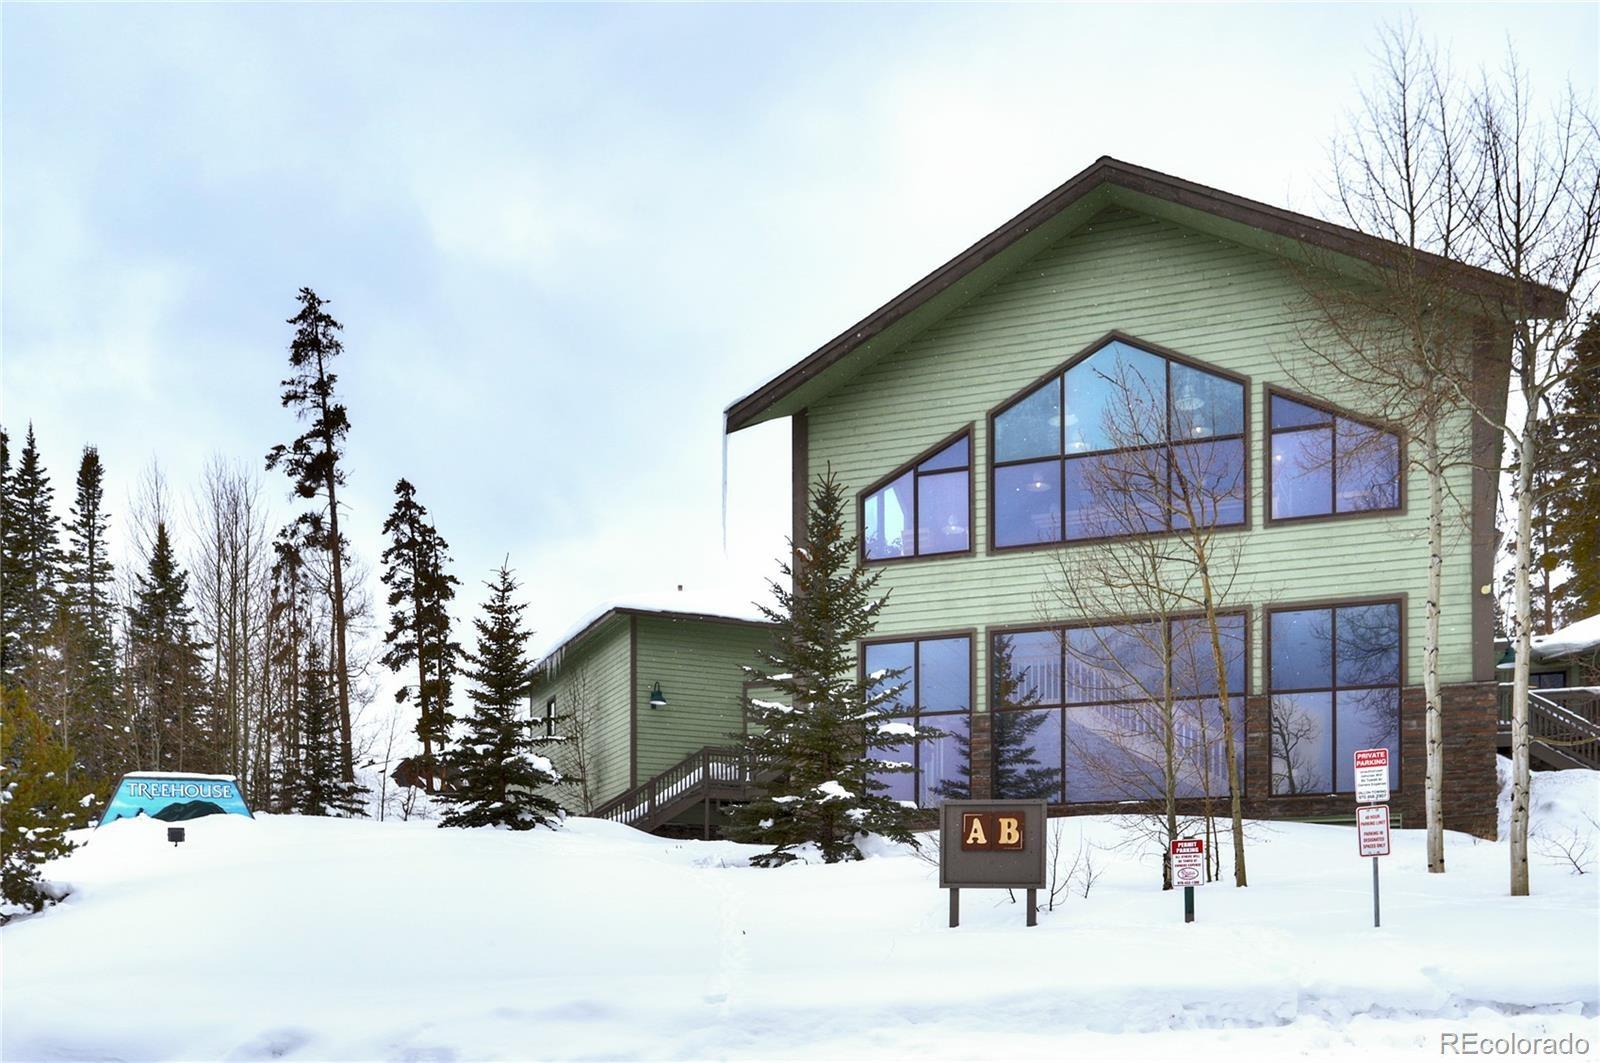 MLS# 3104503 - 26 - 2400 Lodge Pole Circle #206, Silverthorne, CO 80498